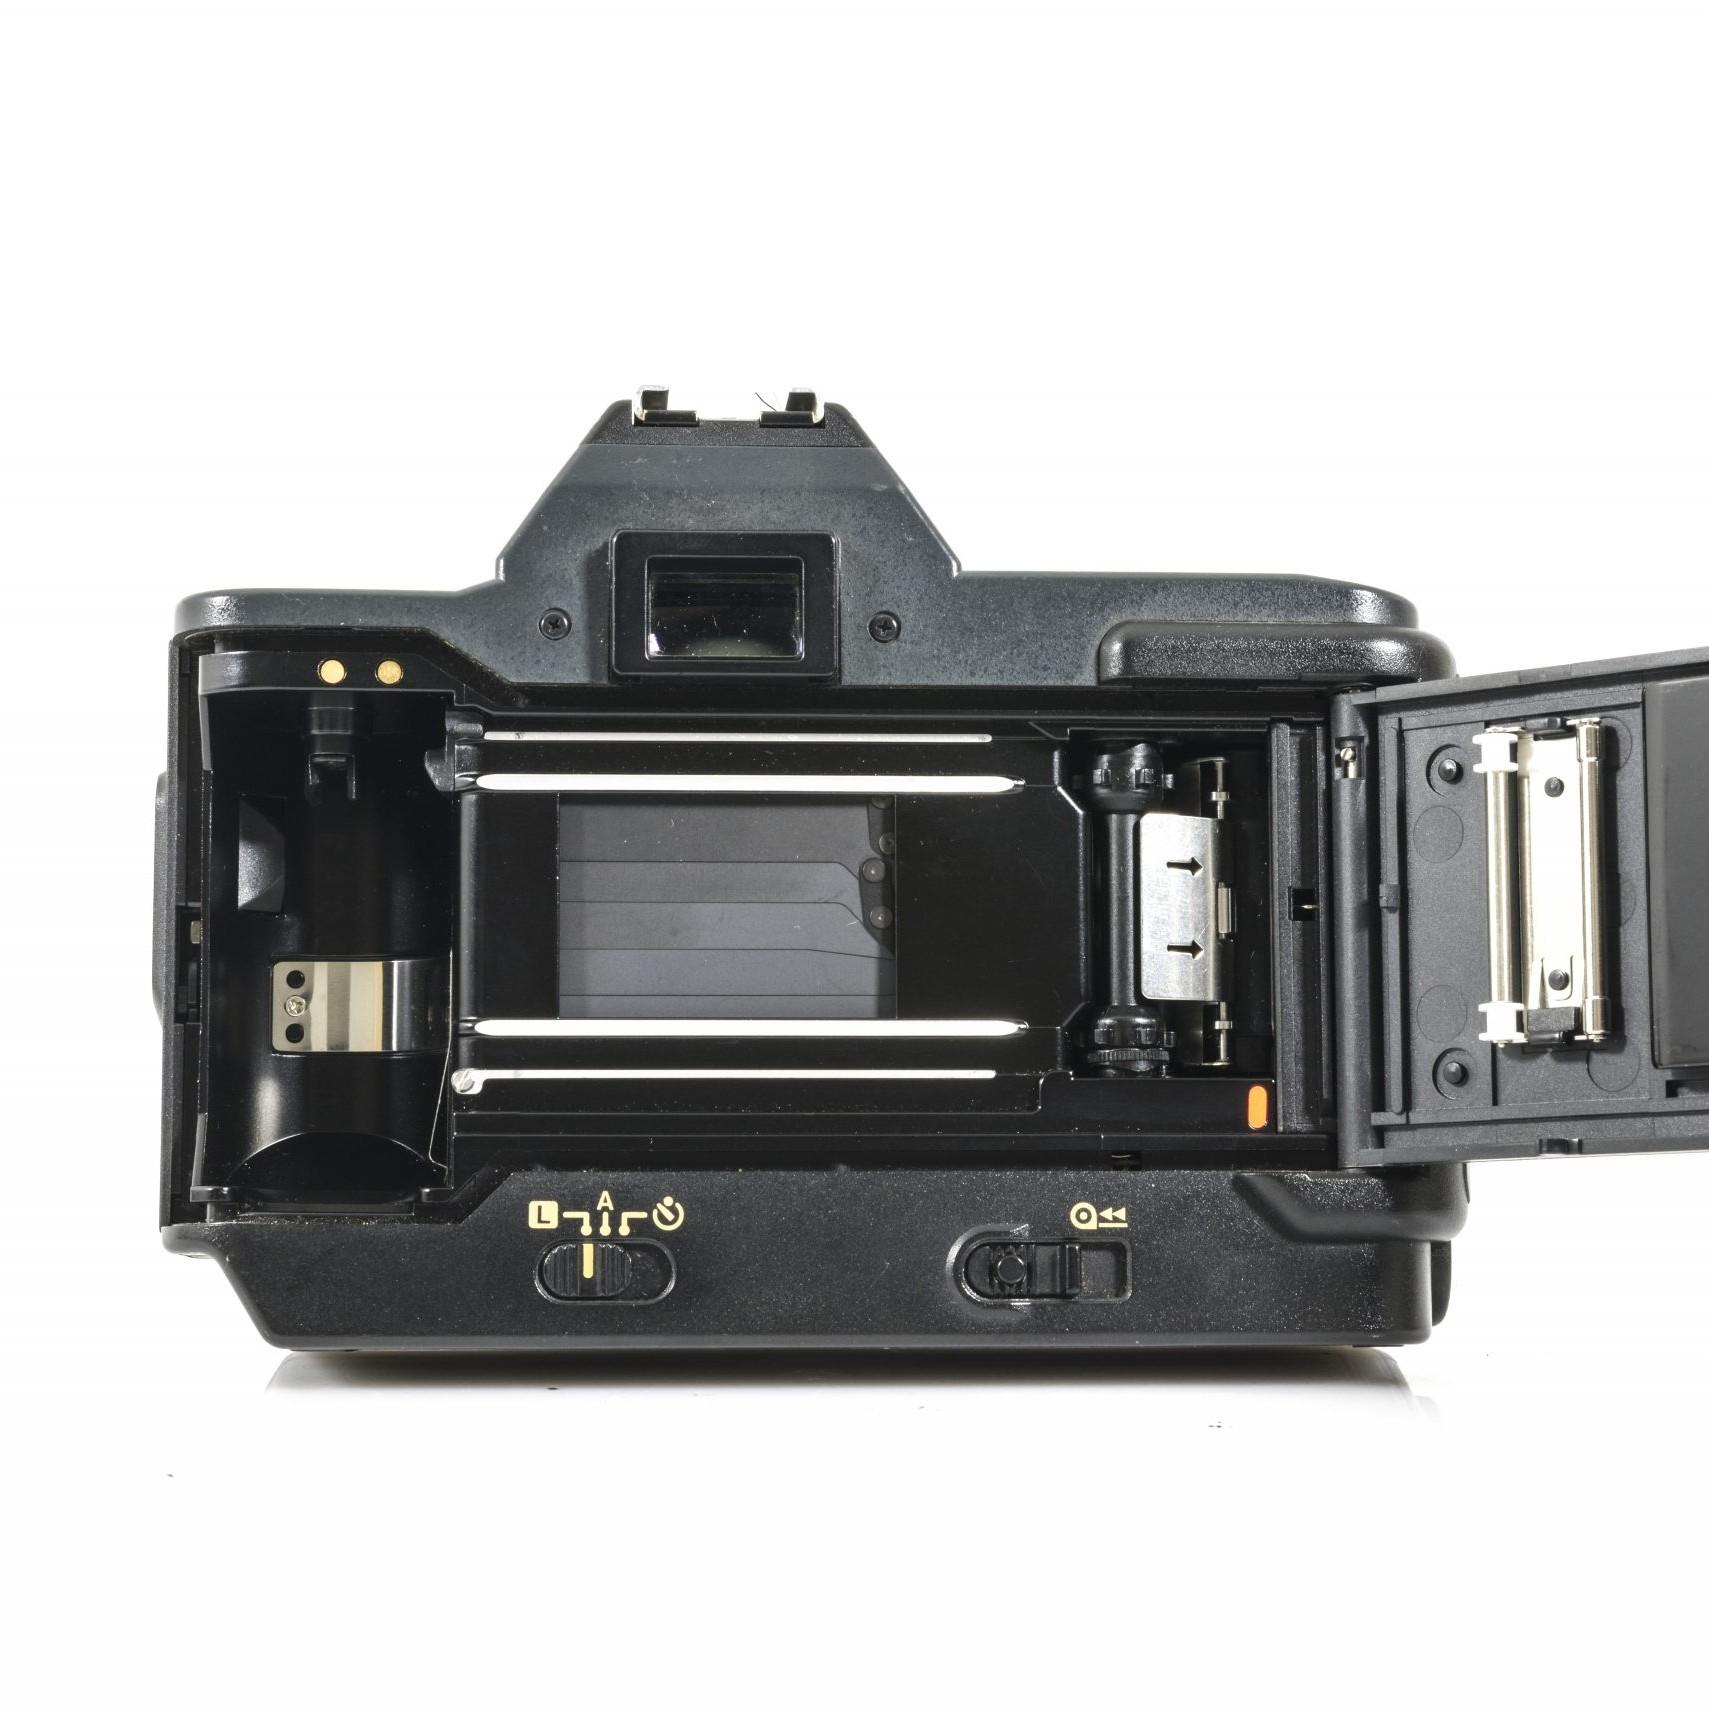 Canon T80 35mm Film SLR Camera + 35-70mm F/3.5-4.5 Lens & 75-200mm AC F4.5 Lens